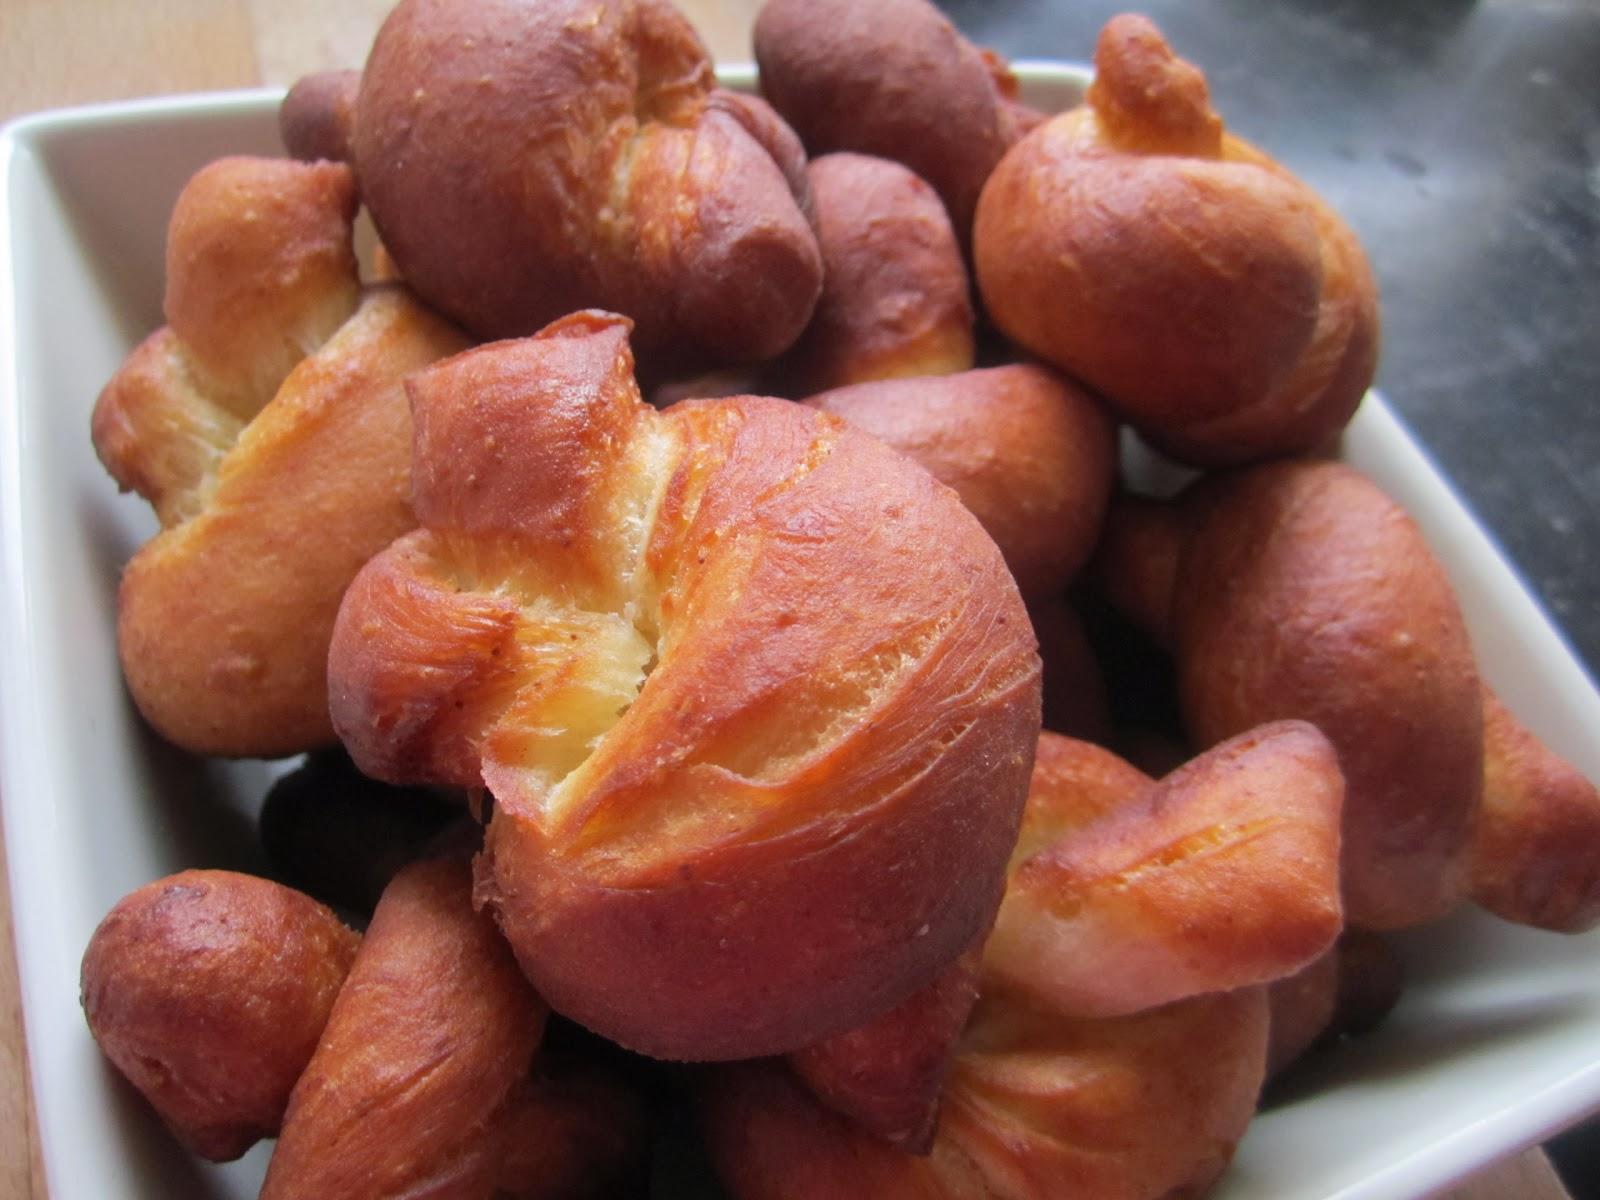 P te chou beignet en n ud saveurs d 39 ici mbuji mayi - Recette beignet au sucre moelleux ...